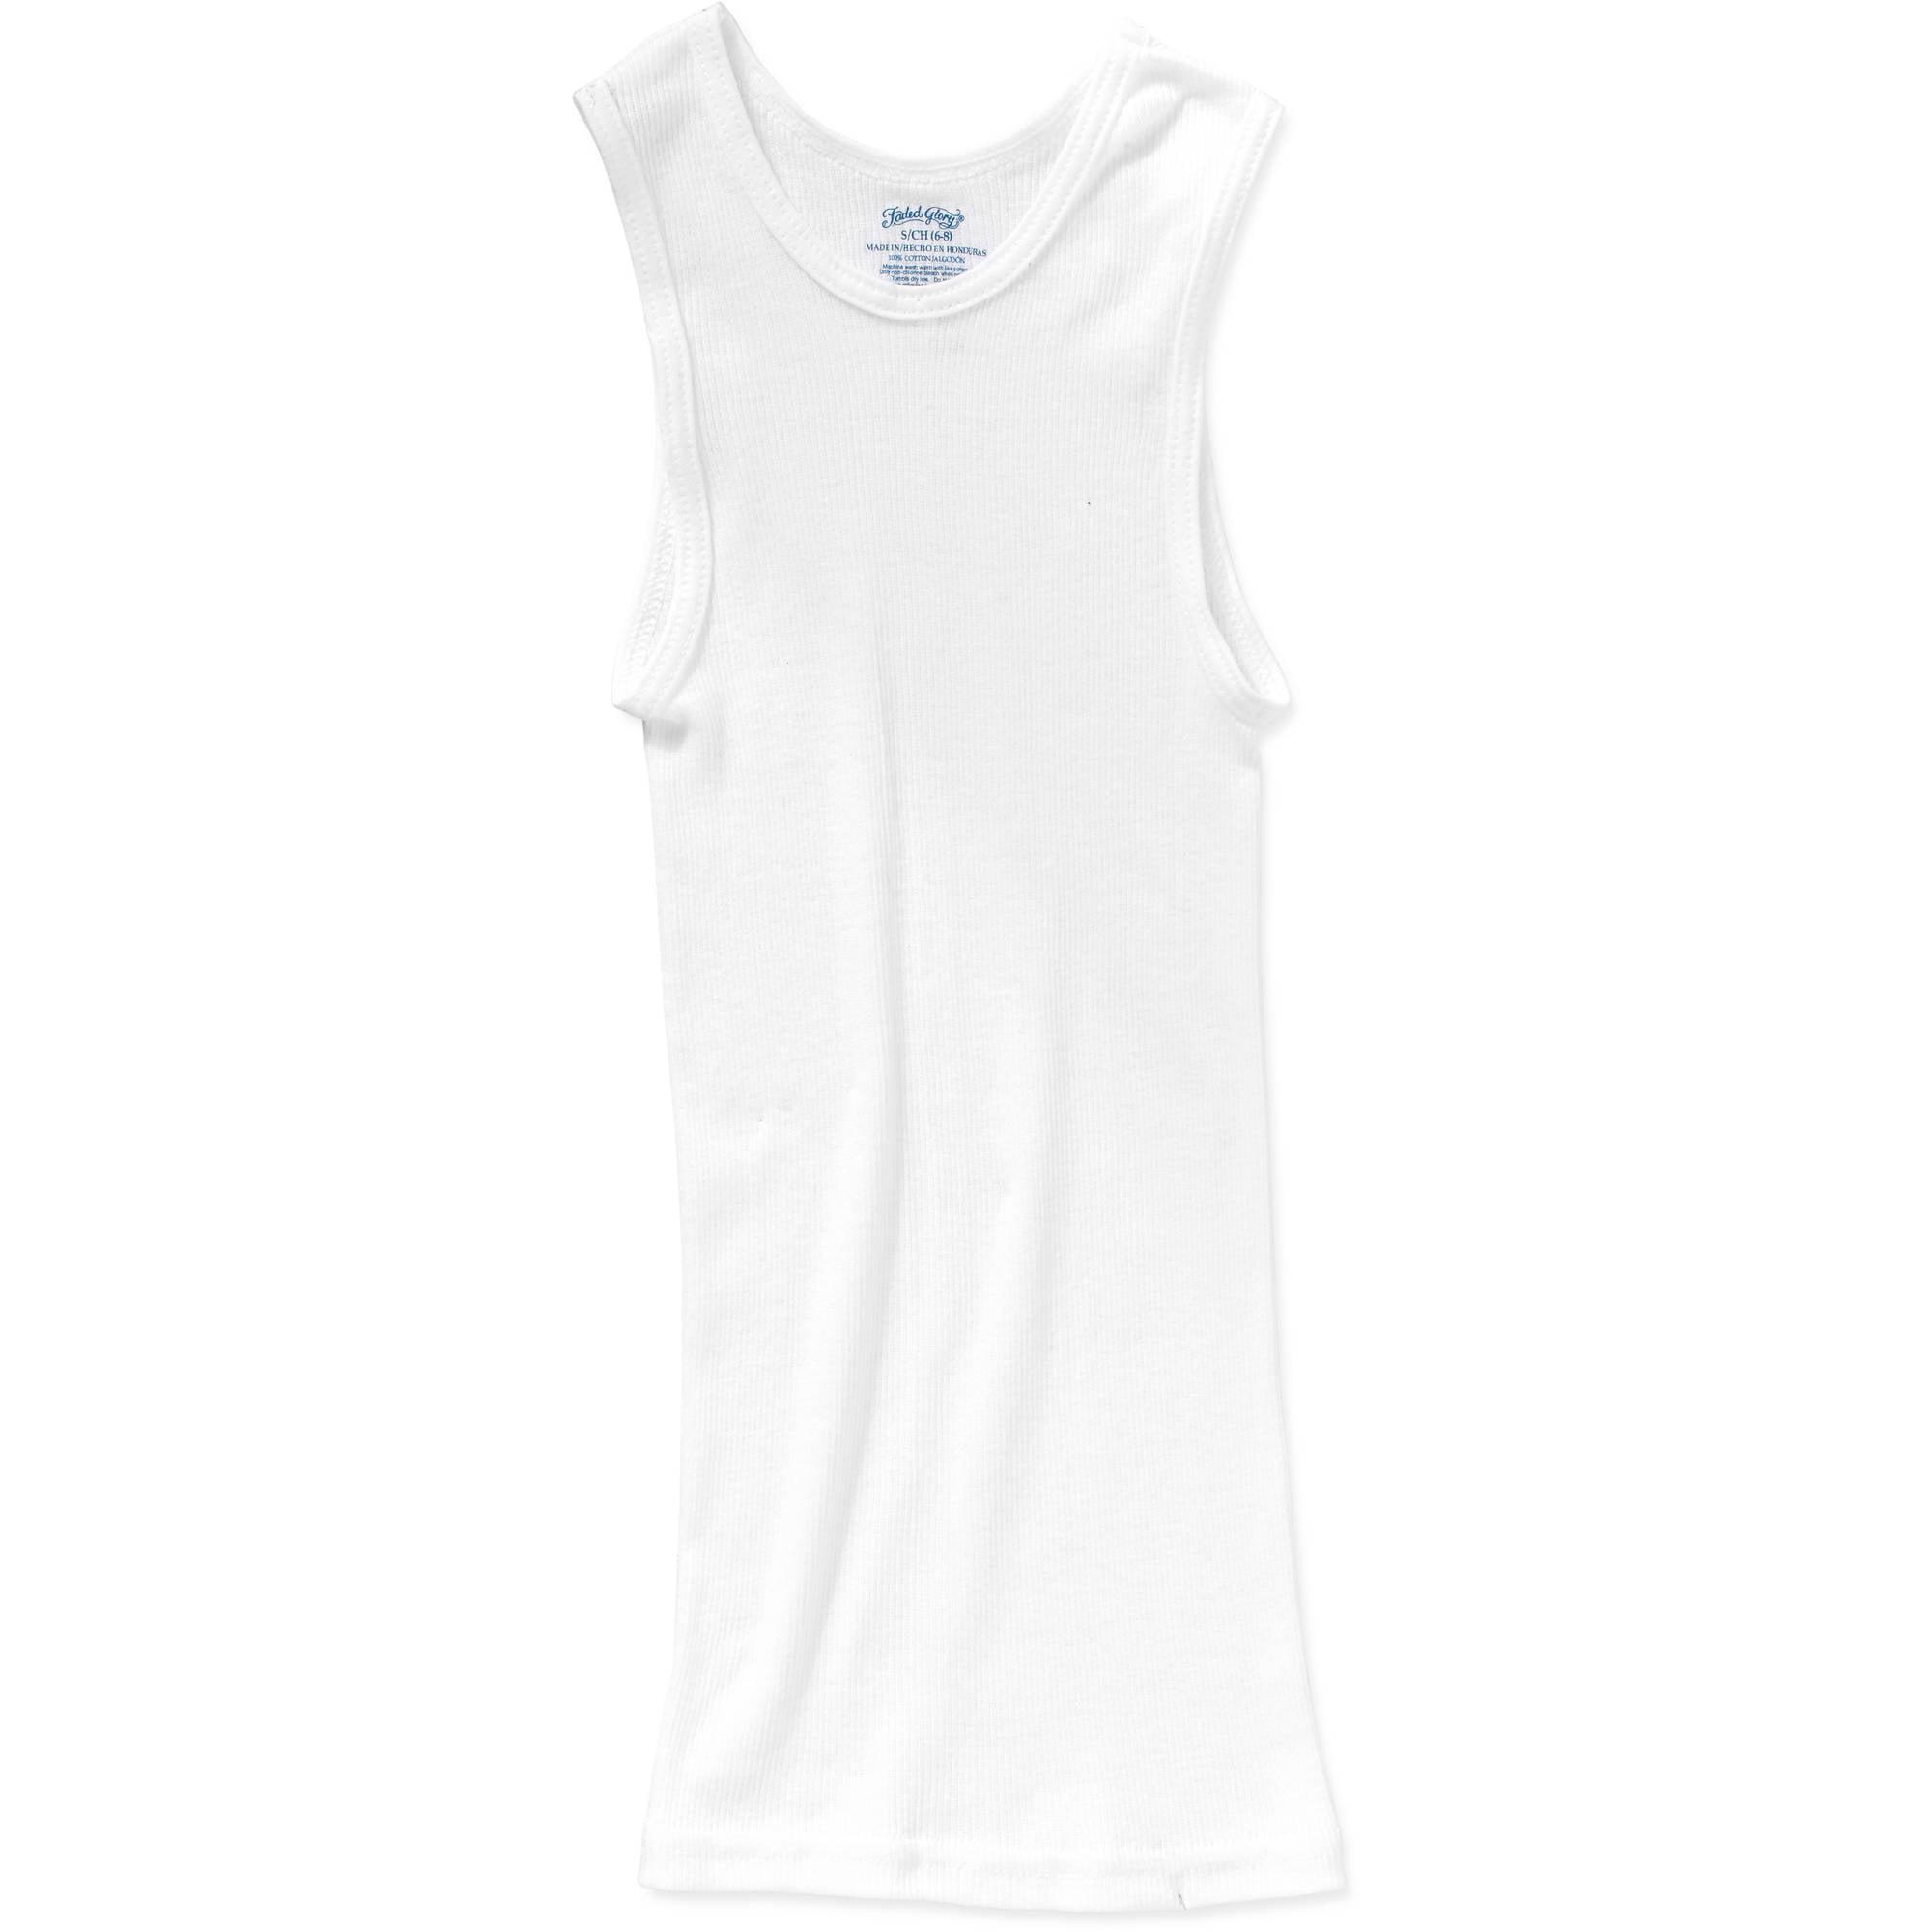 c7fd7577482b9 Faded Glory - Boys  A-Shirt Sleeveless Undershirt